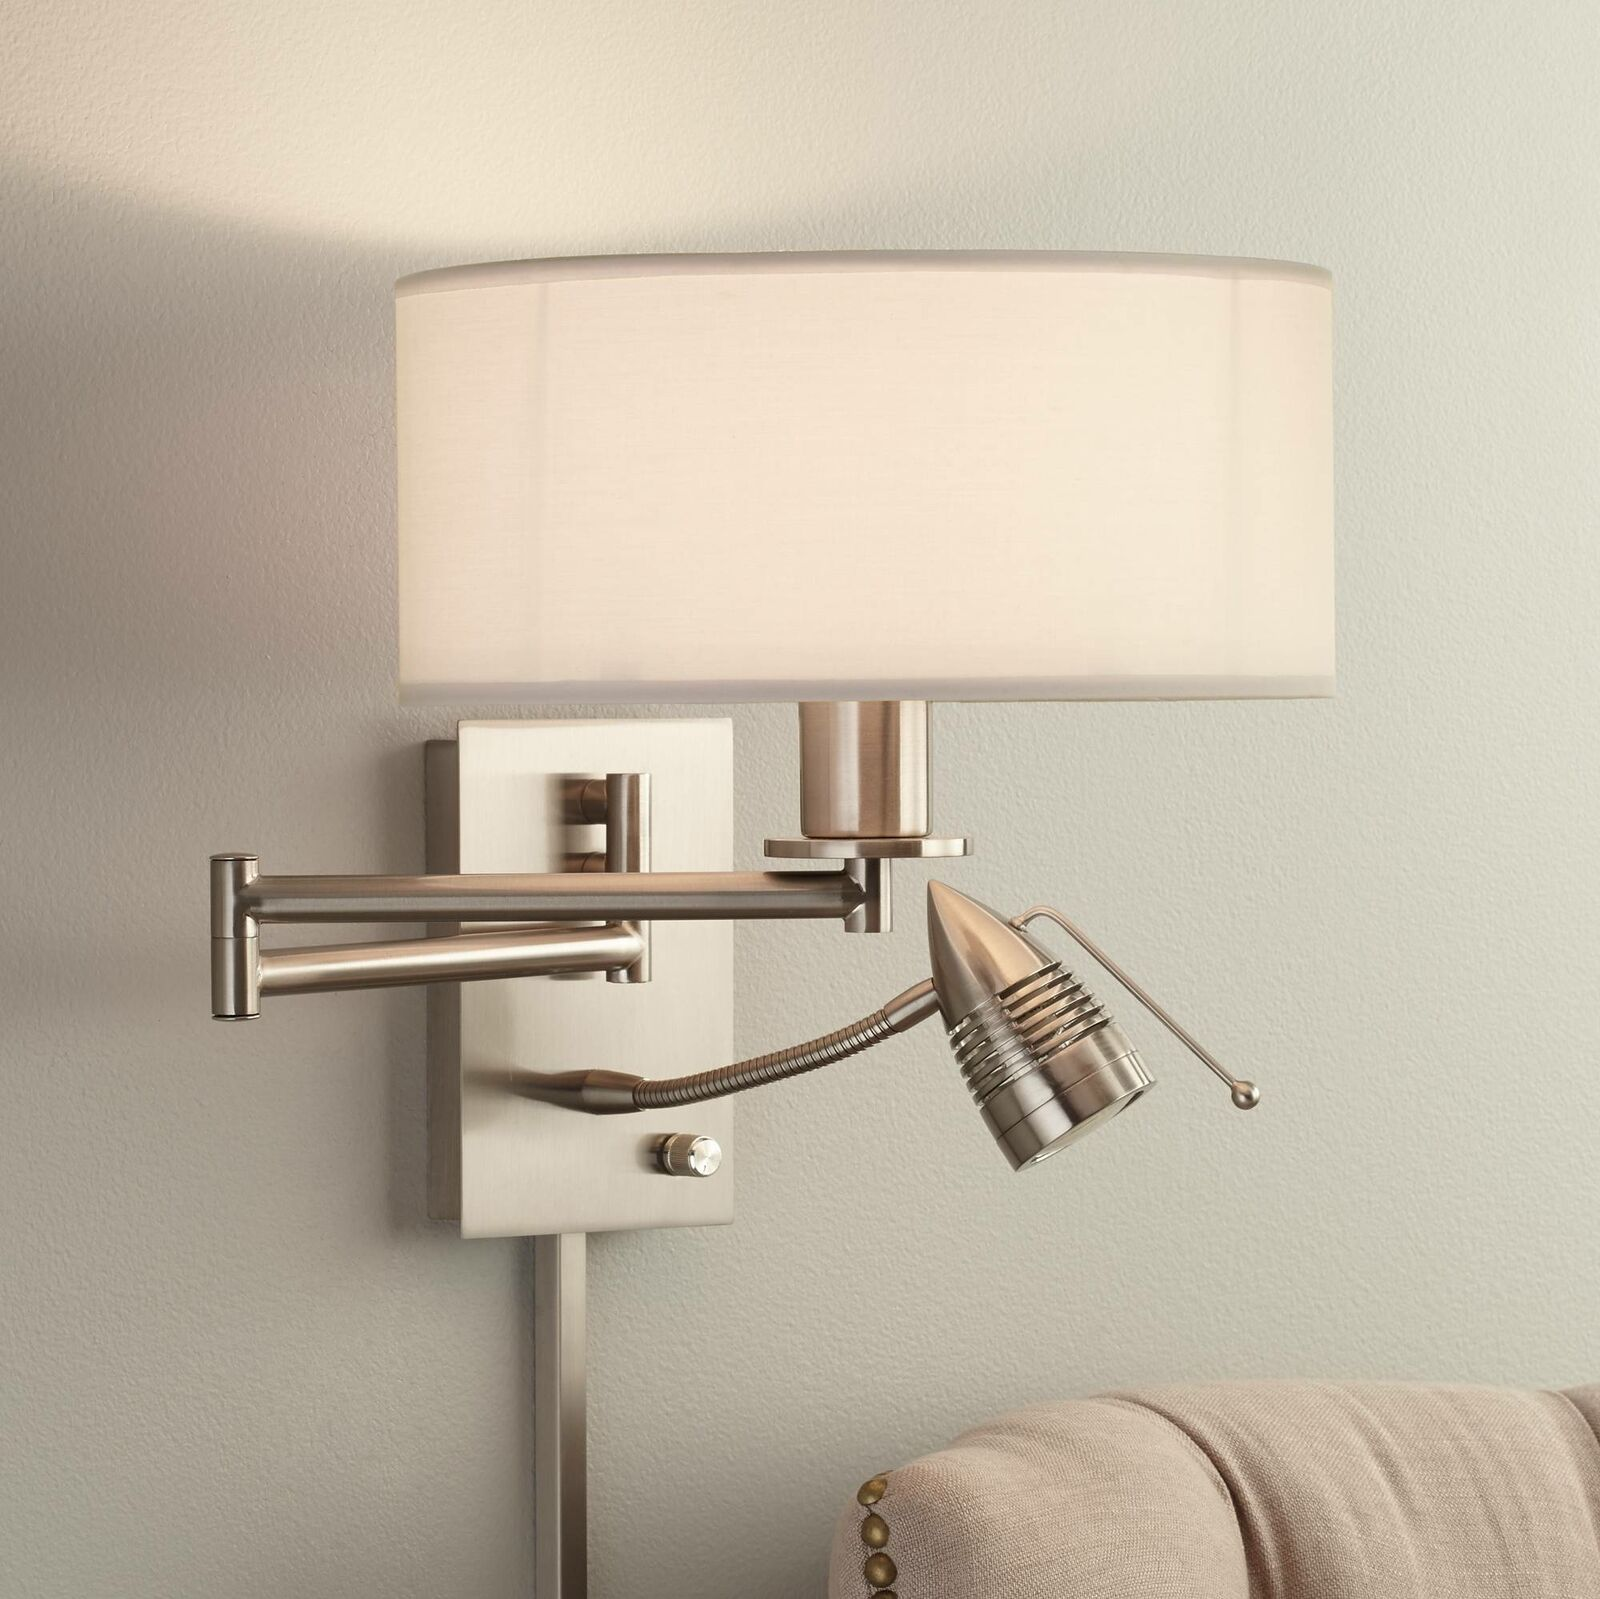 Modern Swing Arm Wall Lamp Led Nickel Plug In Fixture Bedroom Bedside Reading For Sale Online